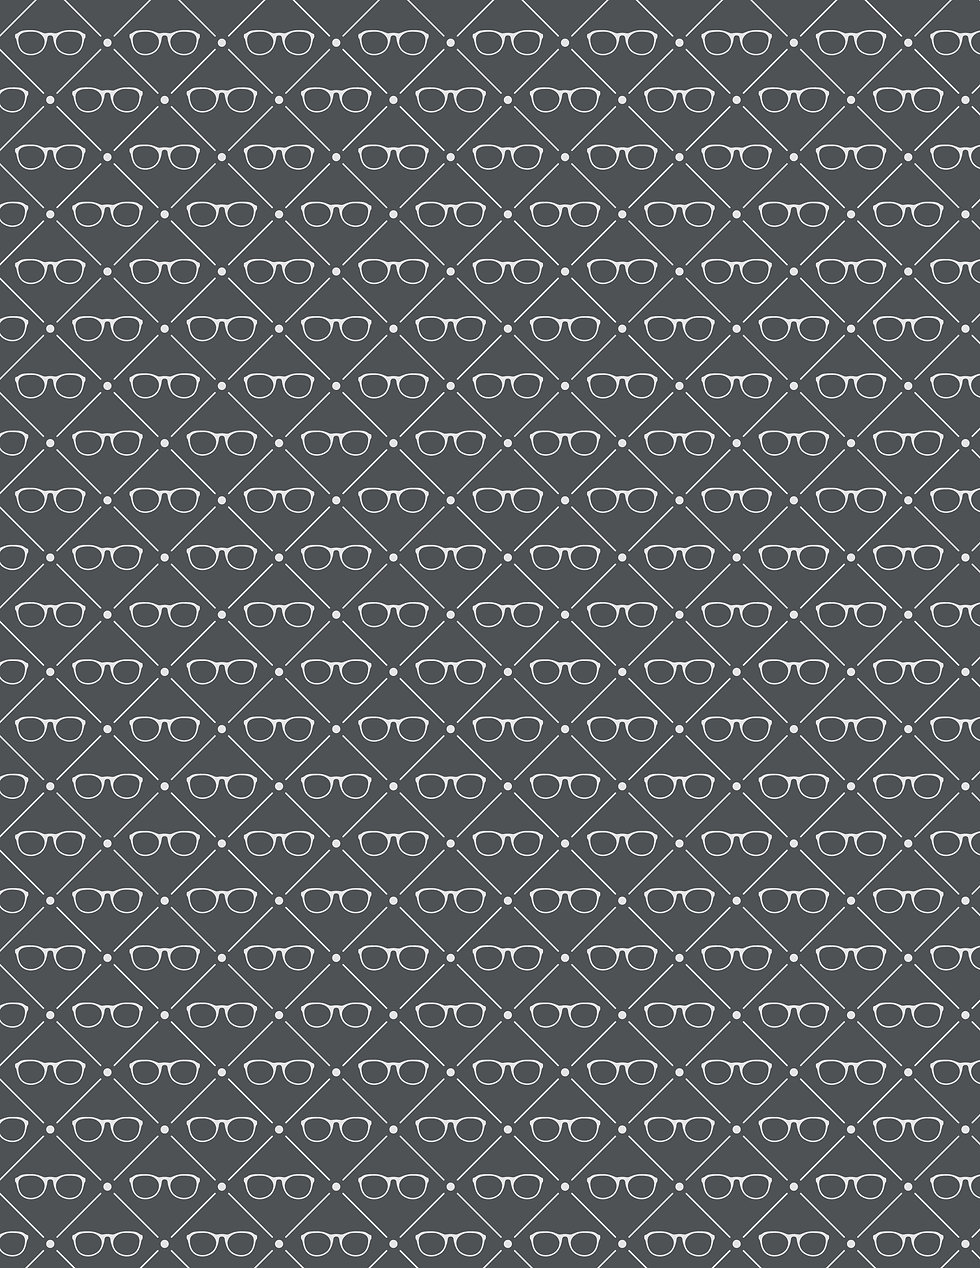 eyeglass pattern dark.jpg